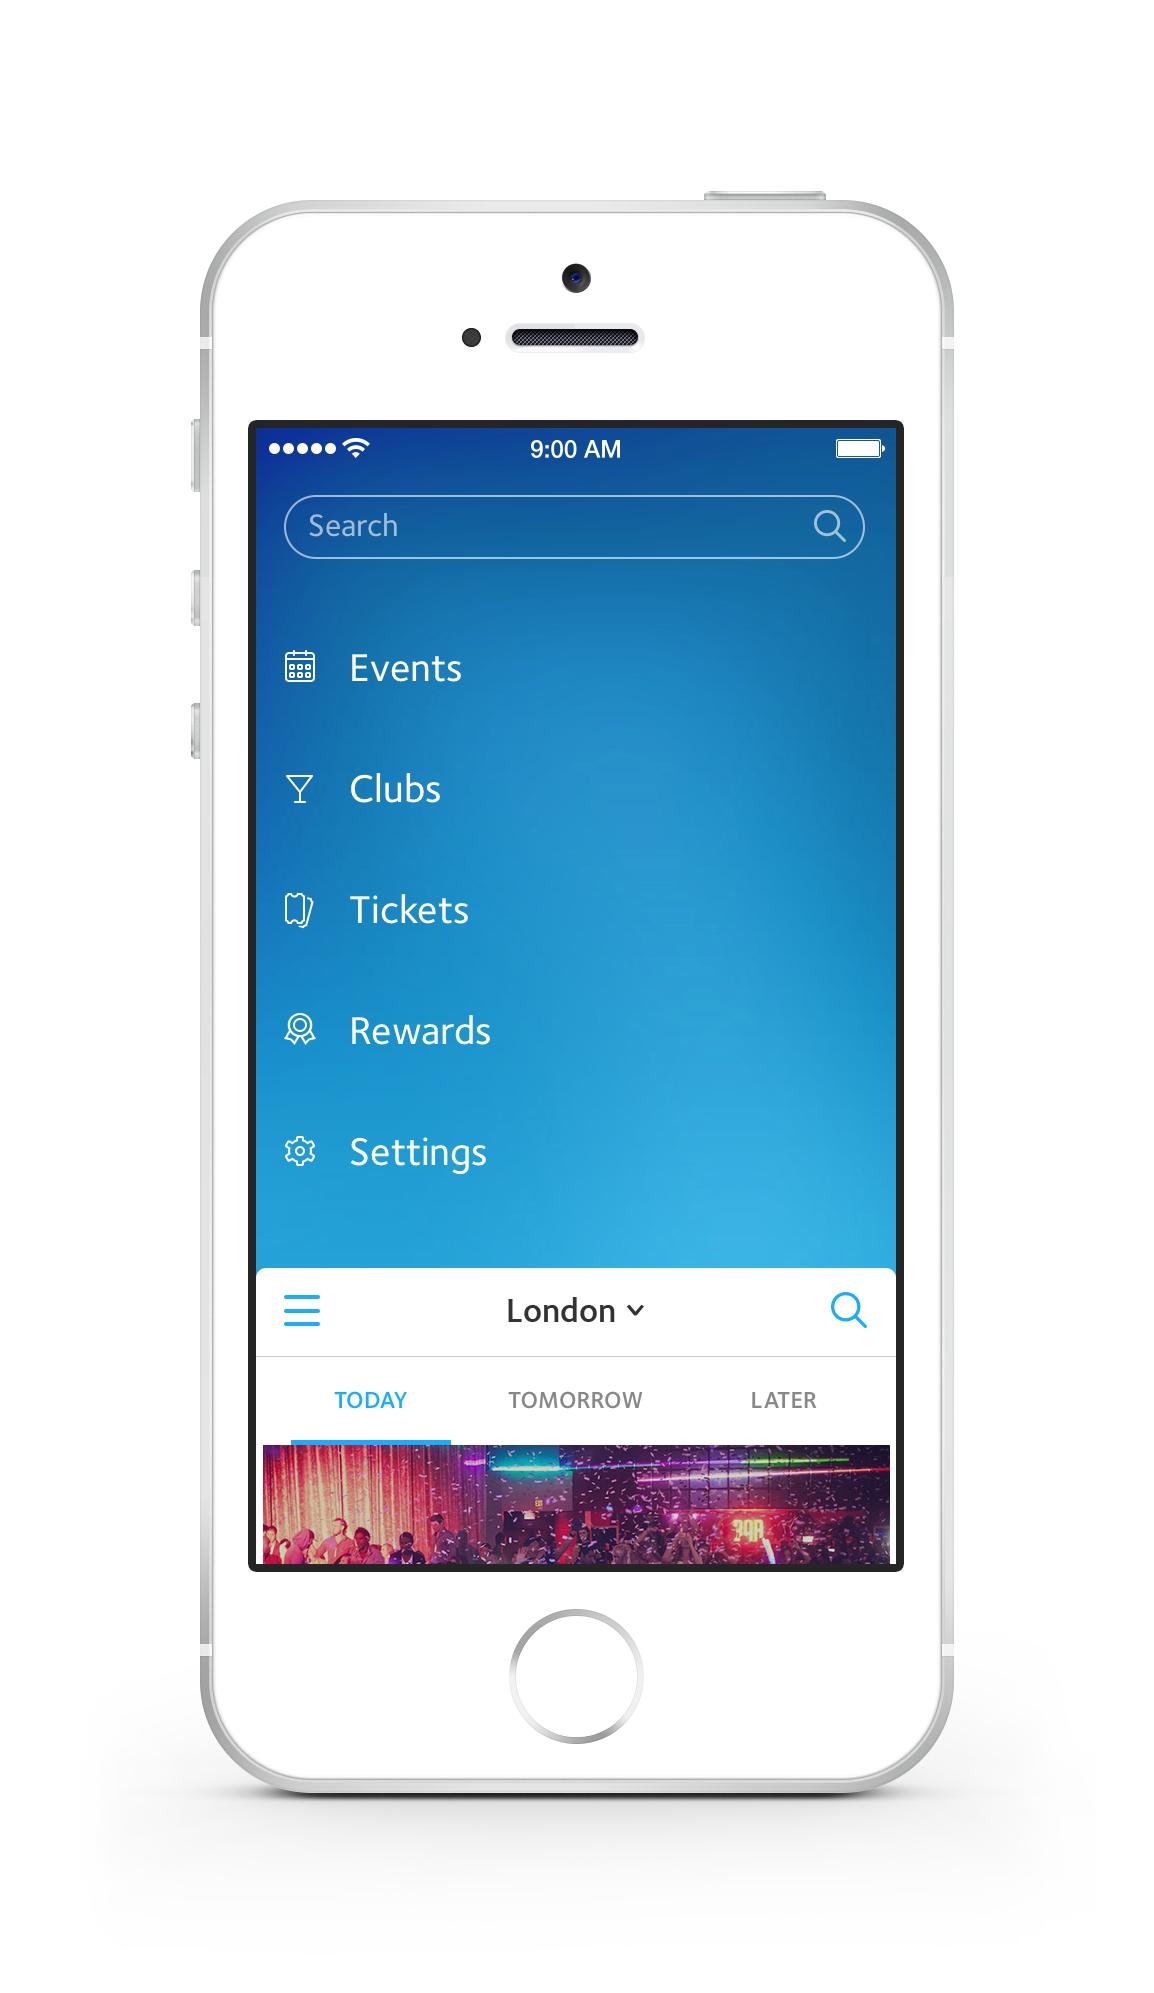 Dribbble - Menu-real-pixels.png by Dejan Markovic #mobile #ui #ux #design #inspiration #navigation #app #interface #ios #android #flat